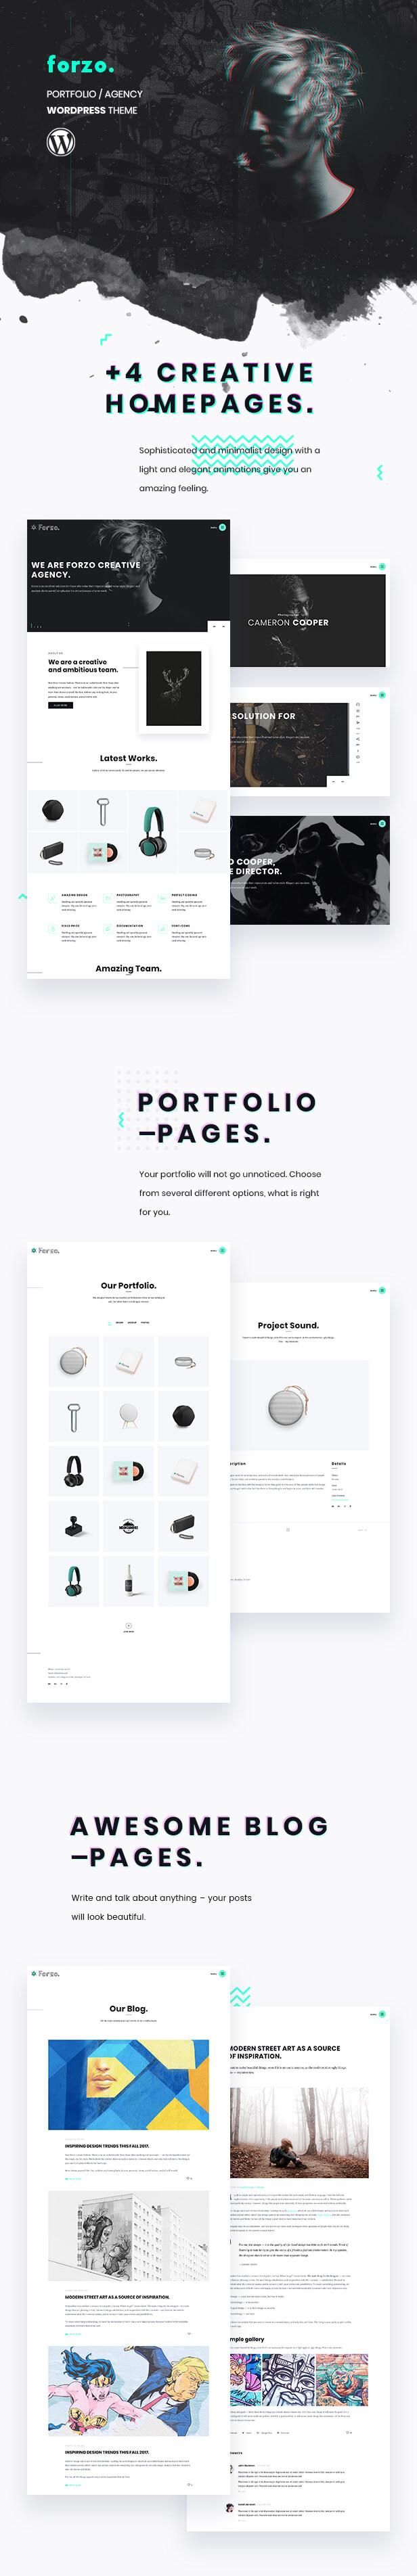 Forzo - Creative Portfolio Agency-Thema - 1